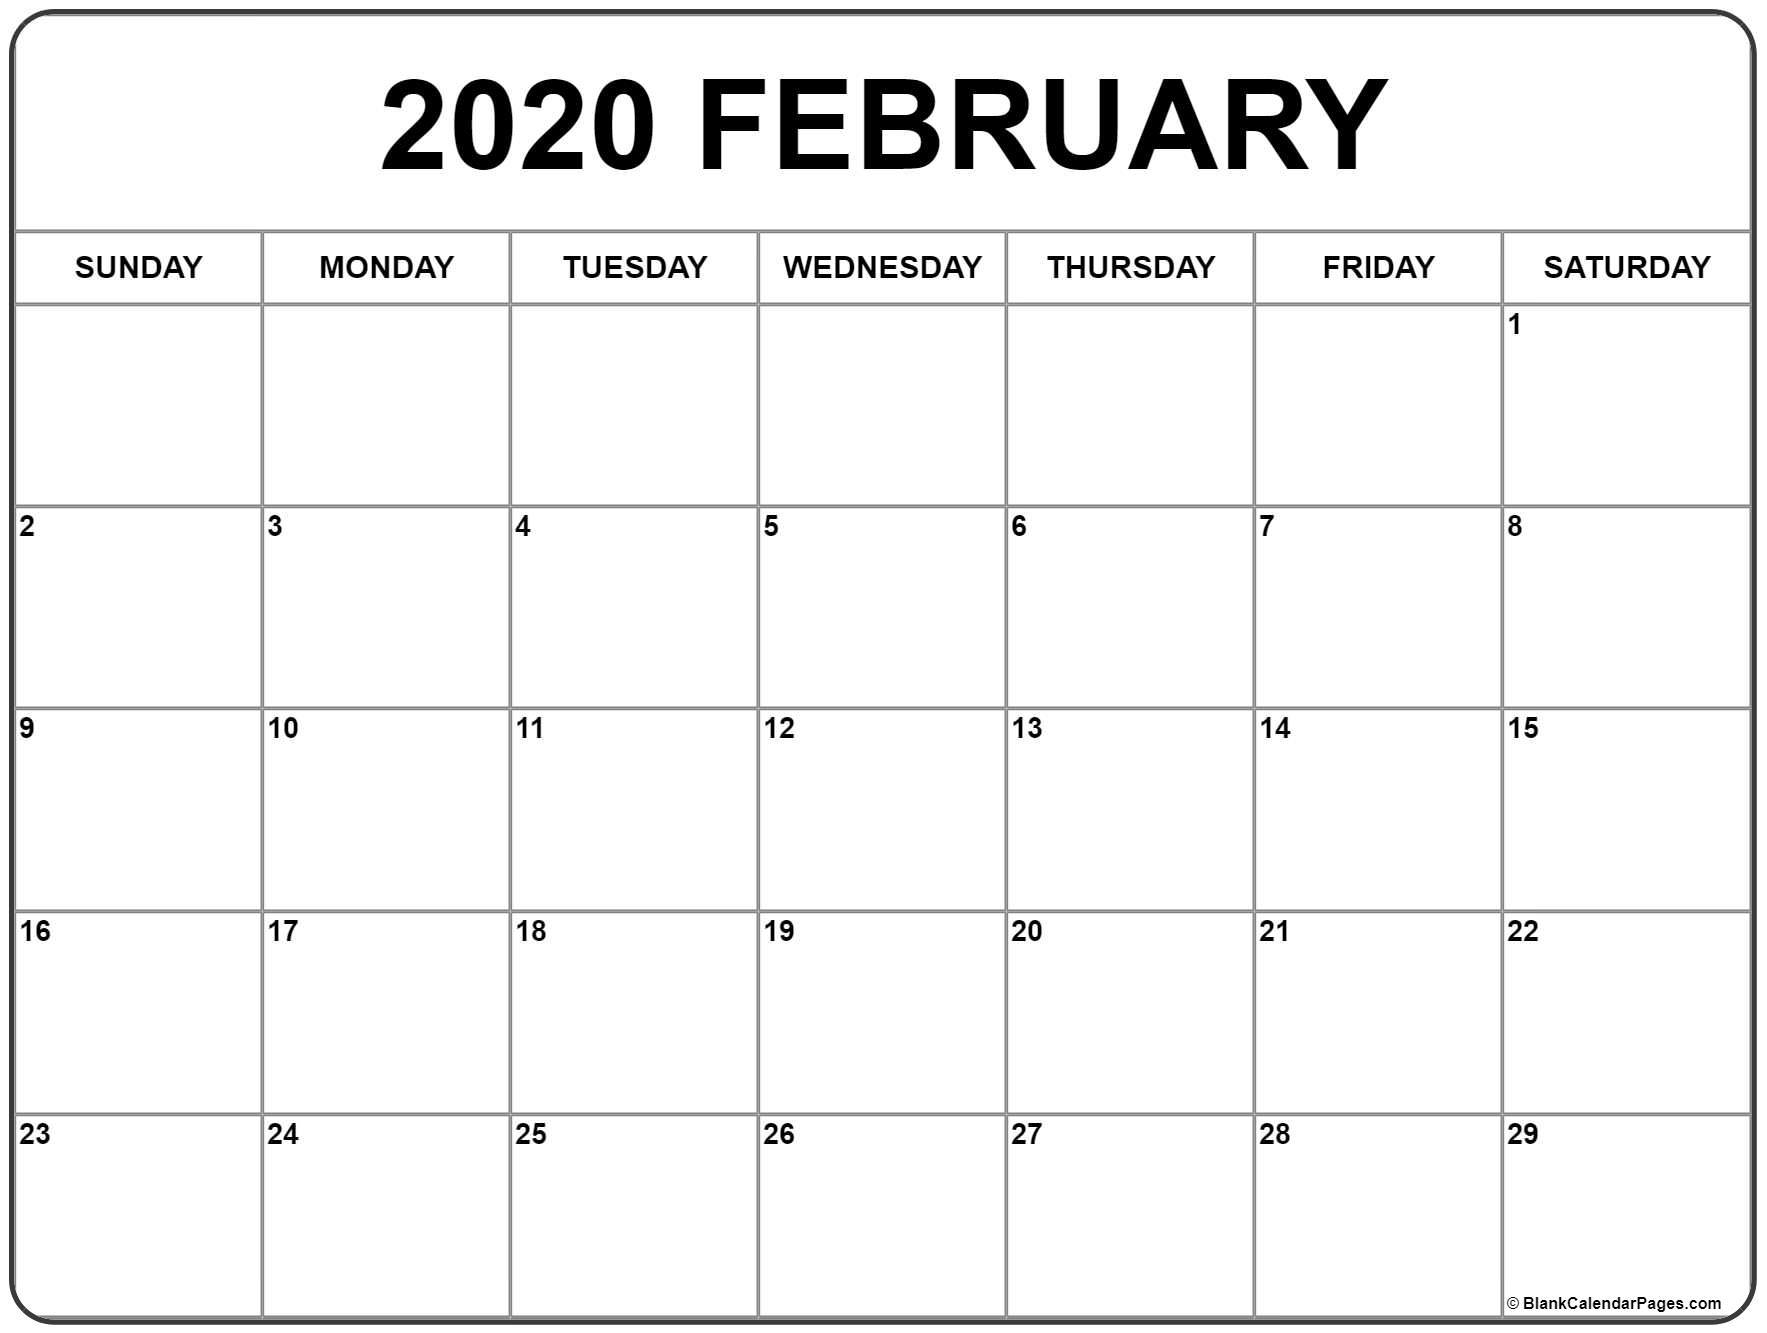 February 2020 Calendar | Free Printable Monthly Calendars regarding 2020 Free Printable Calendar Large Numbers